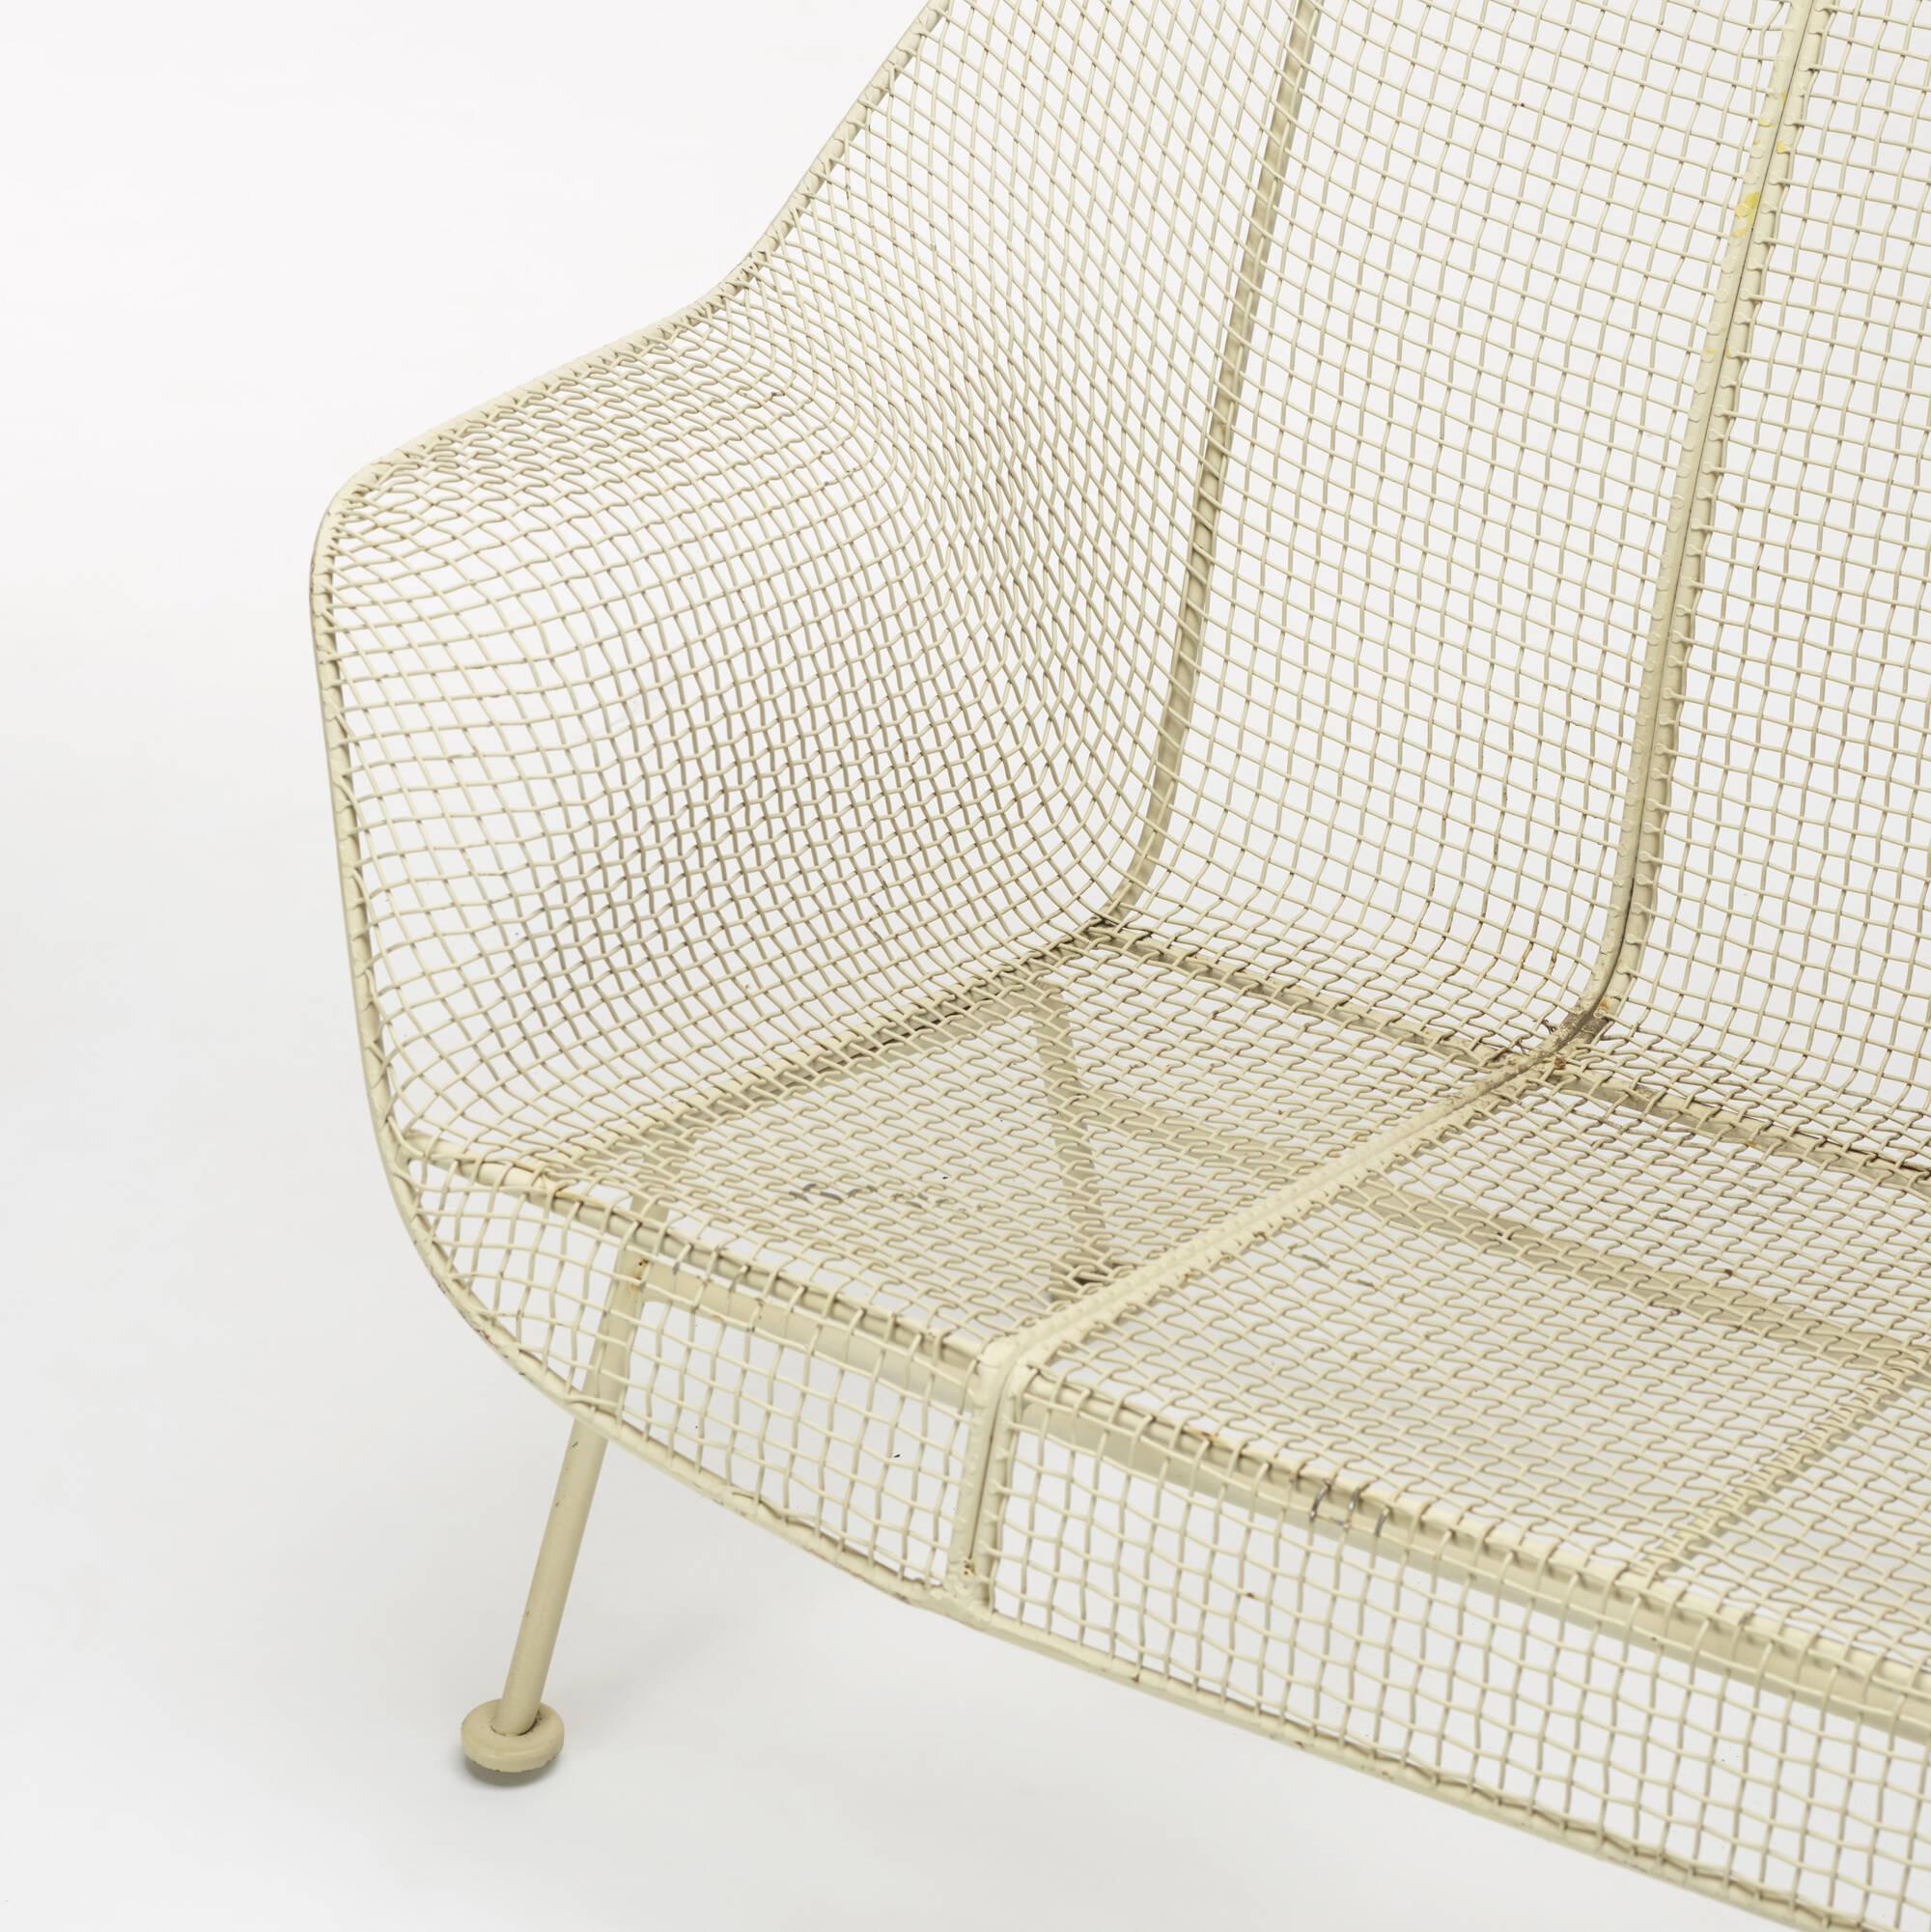 354: Russell Woodard / Sculptura sofa (3 of 3)